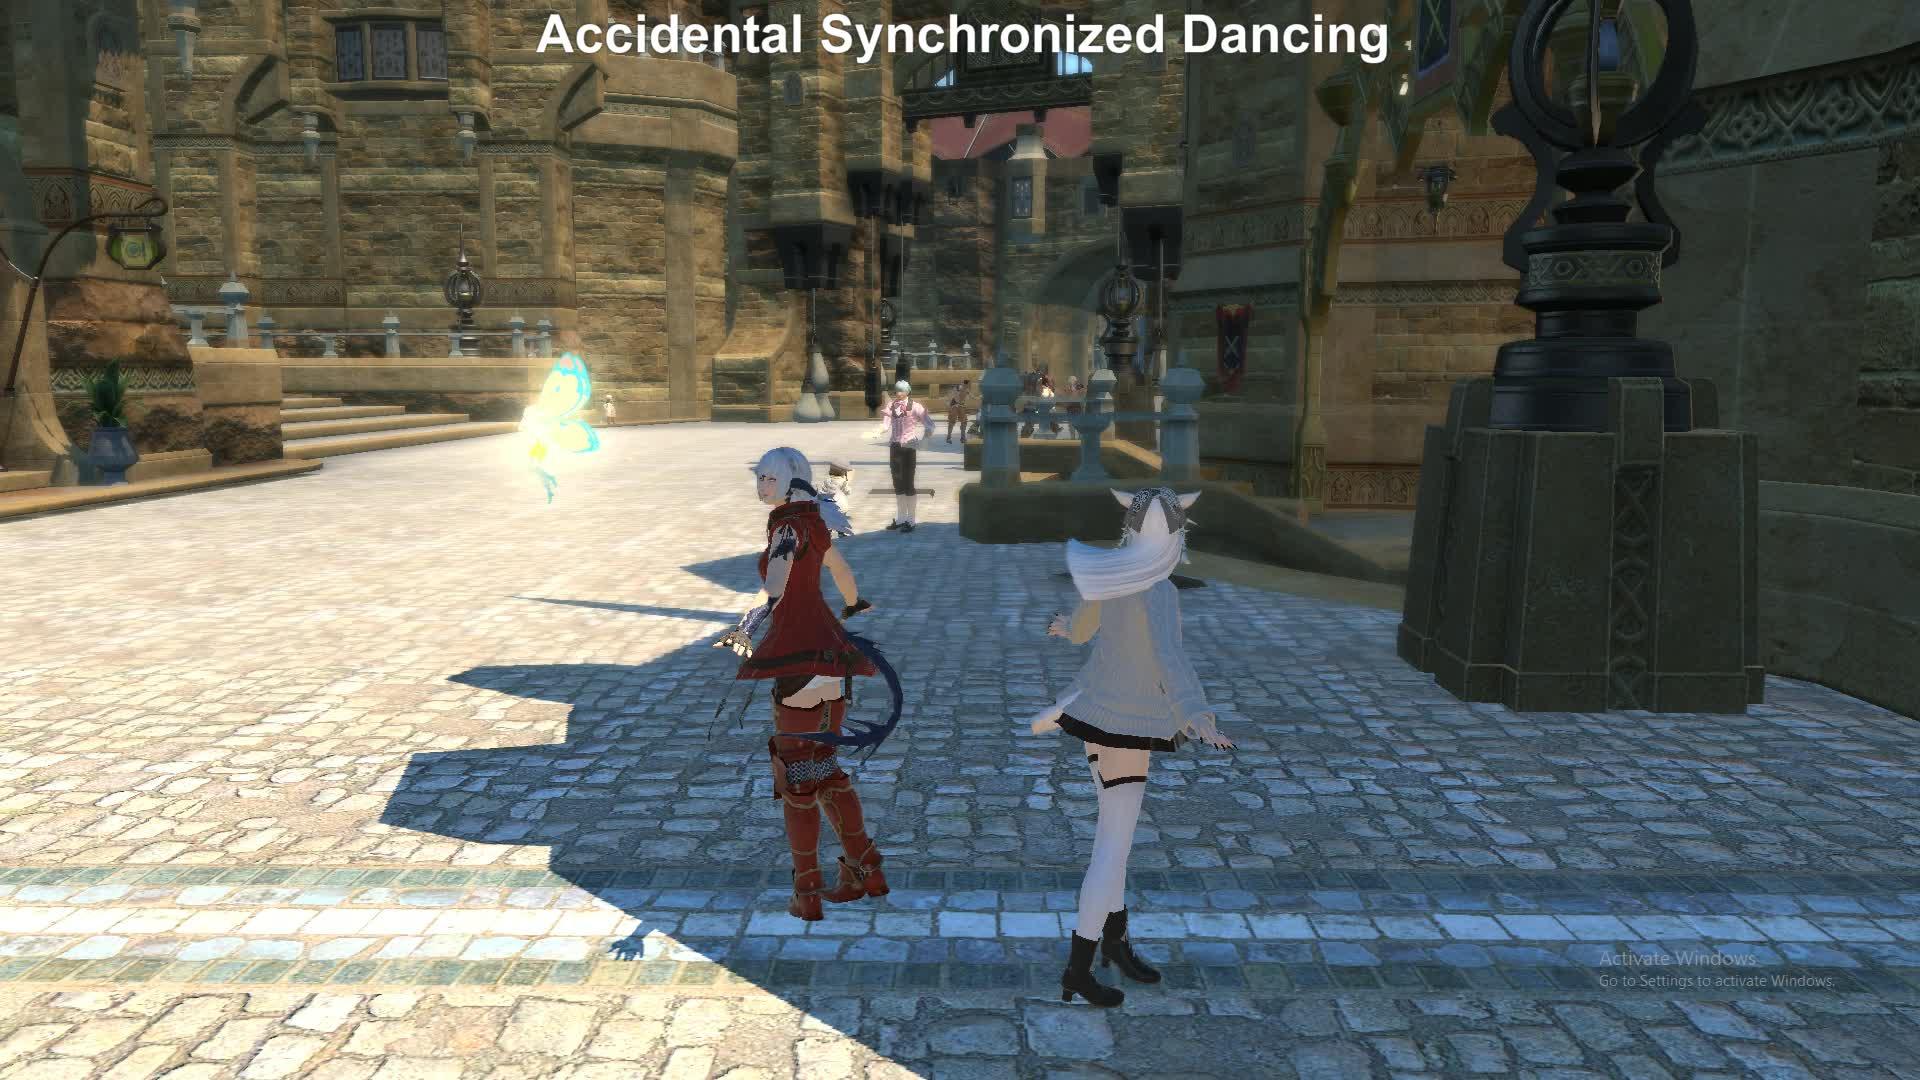 FFXIV Dancing GIFs